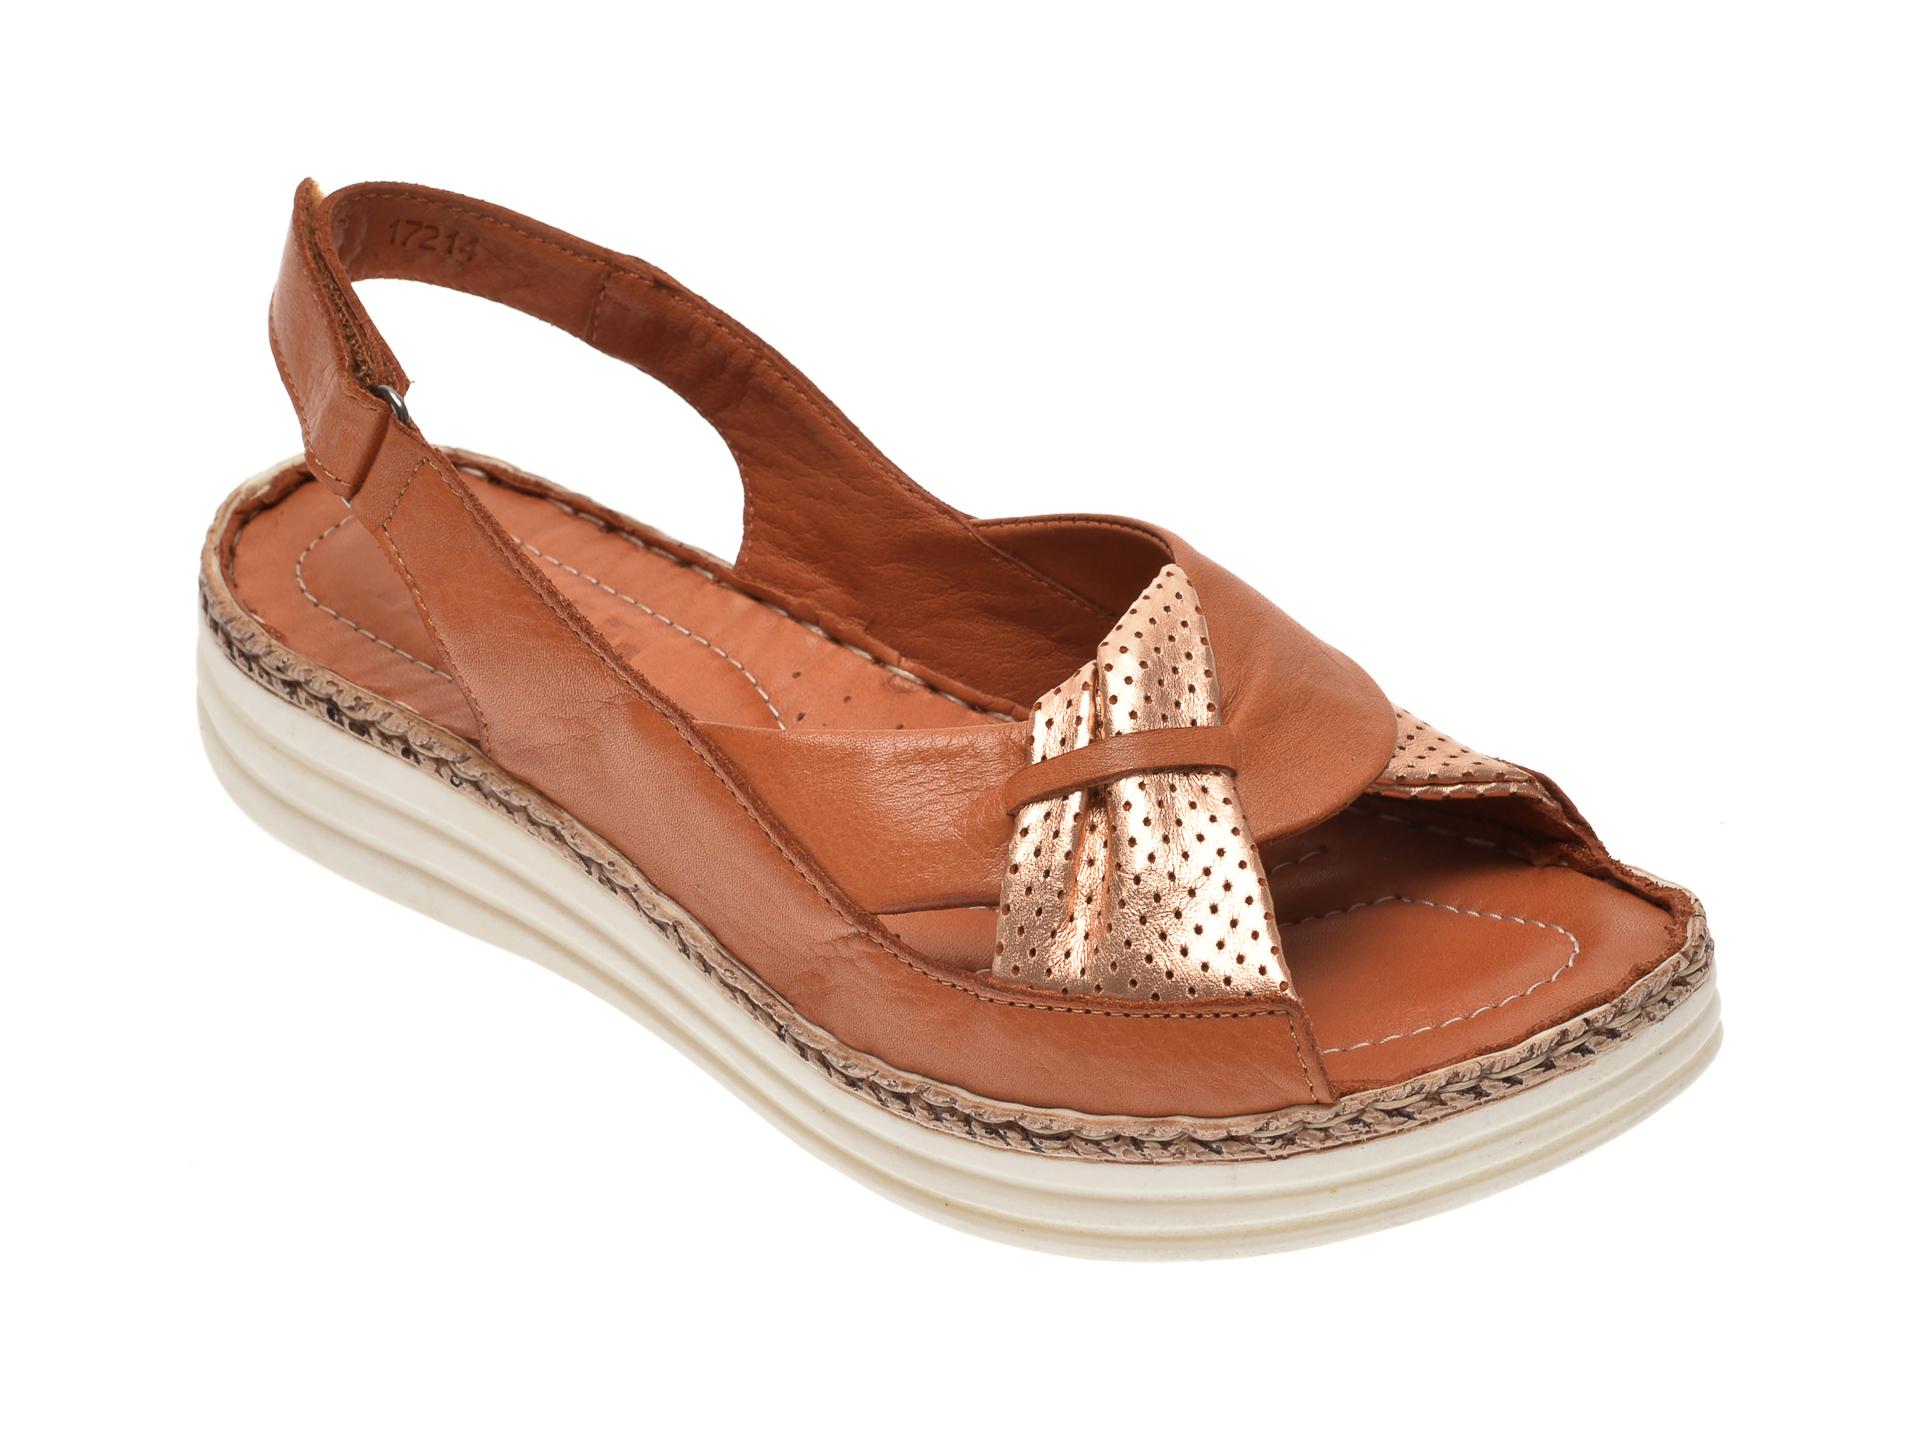 Sandale ON THE ROAD maro, 503, din piele naturala